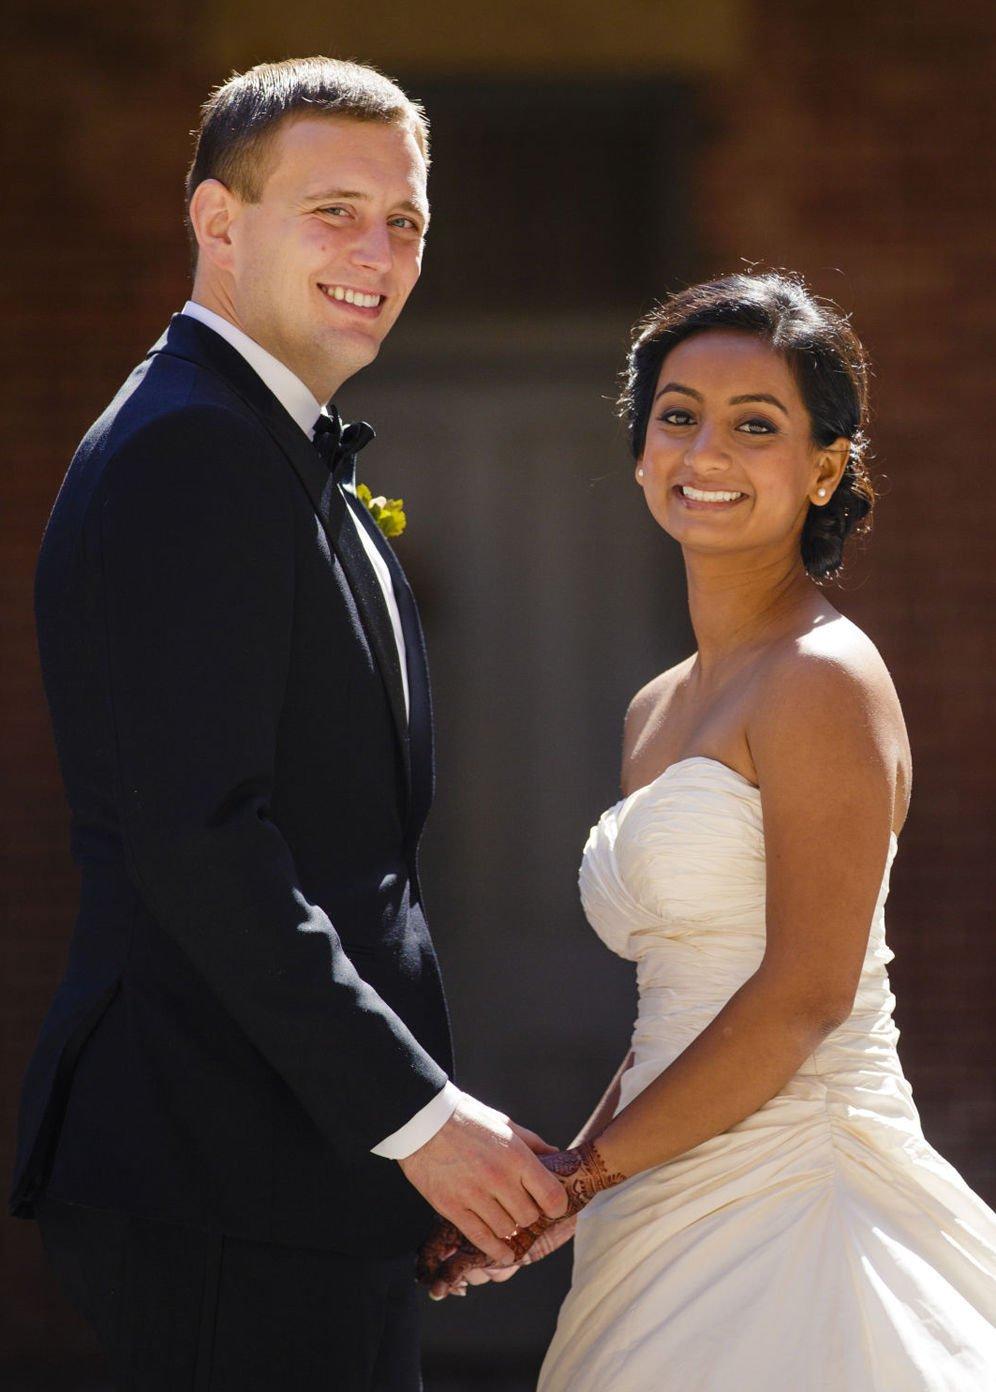 Stubbendieck-Manjunatha Wedding